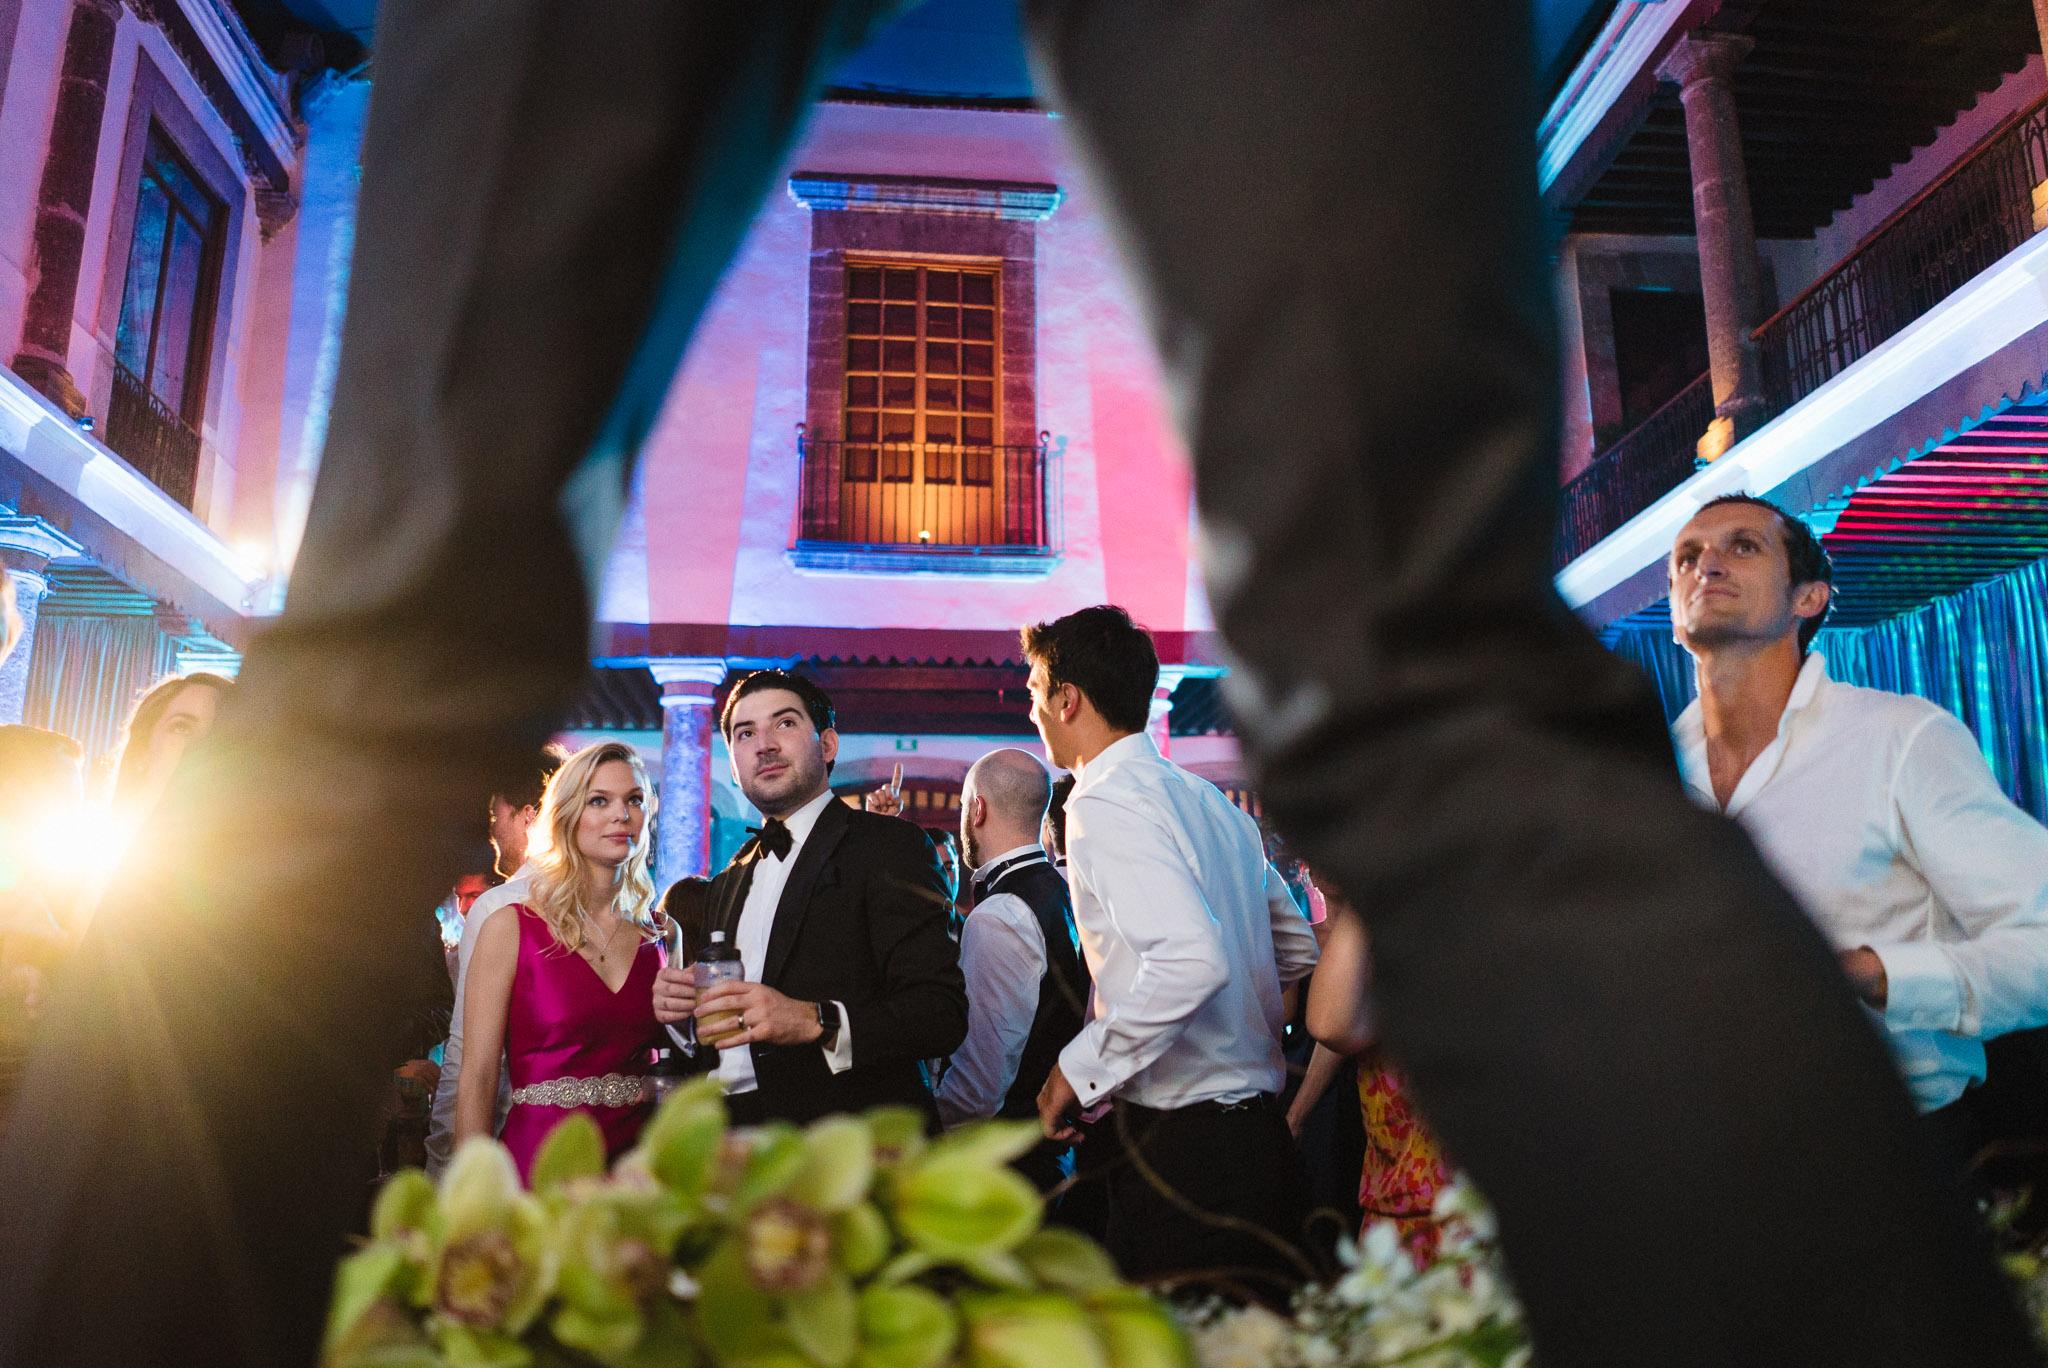 ©www.mauriziosolisbroca.com-20161002maurizio-solis-broca-mexico-canada-wedding-photographer20161002DSC09889-3-Edit.jpg